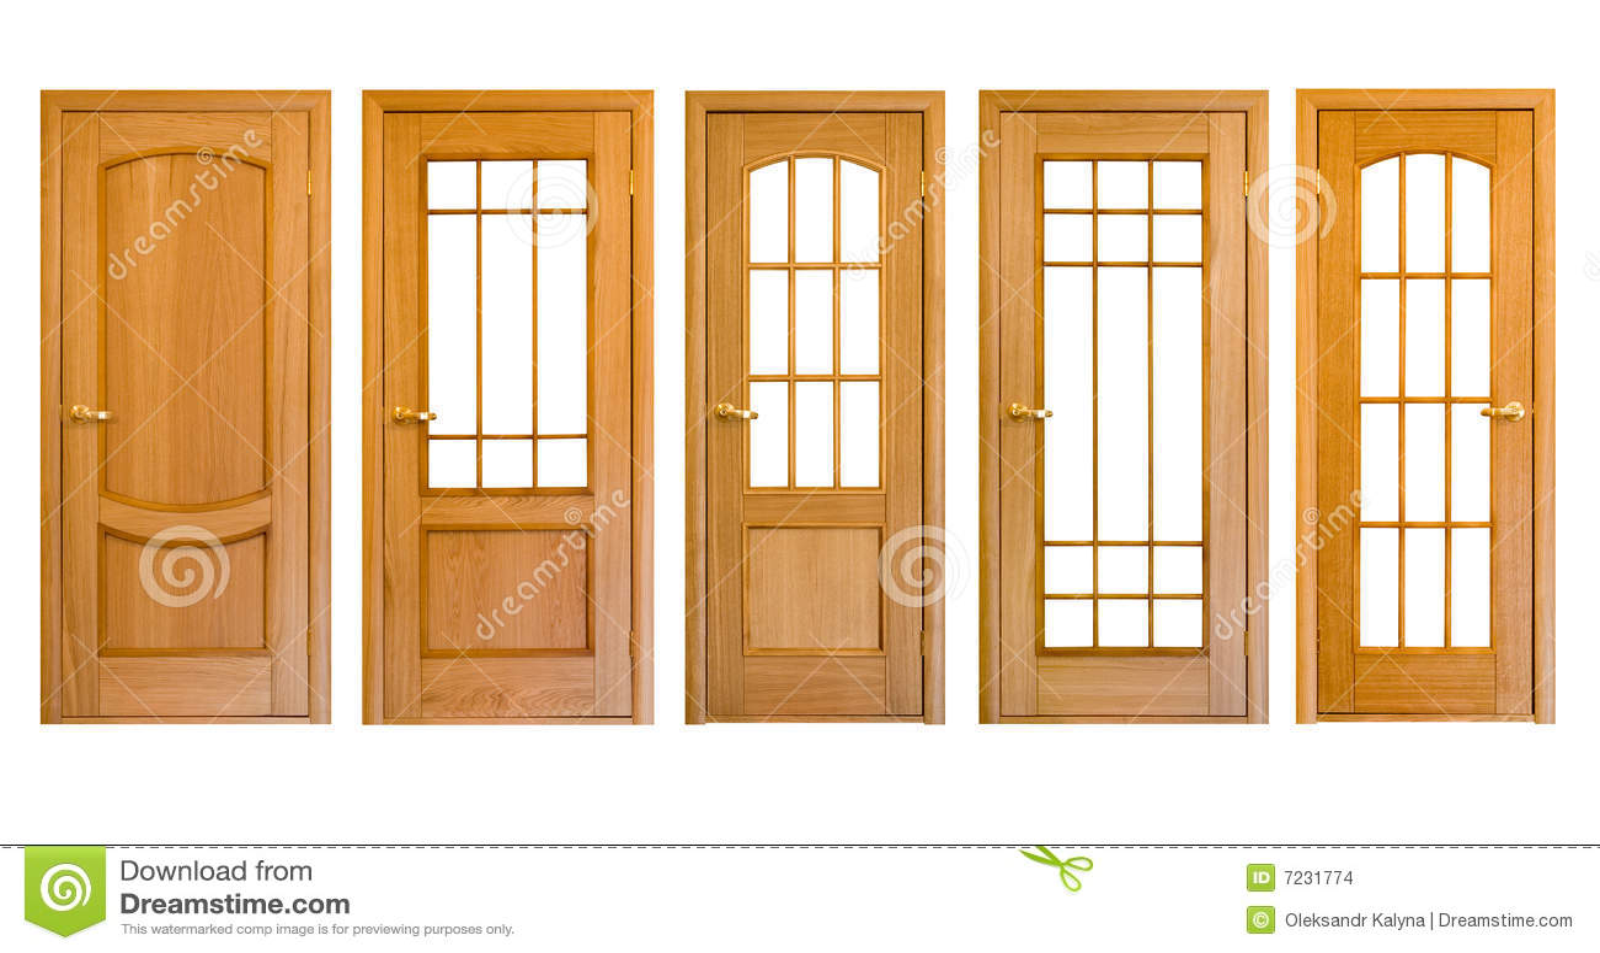 Puertas de madera imagenes de archivo imagen 7231774 for Imagenes de puertas de madera